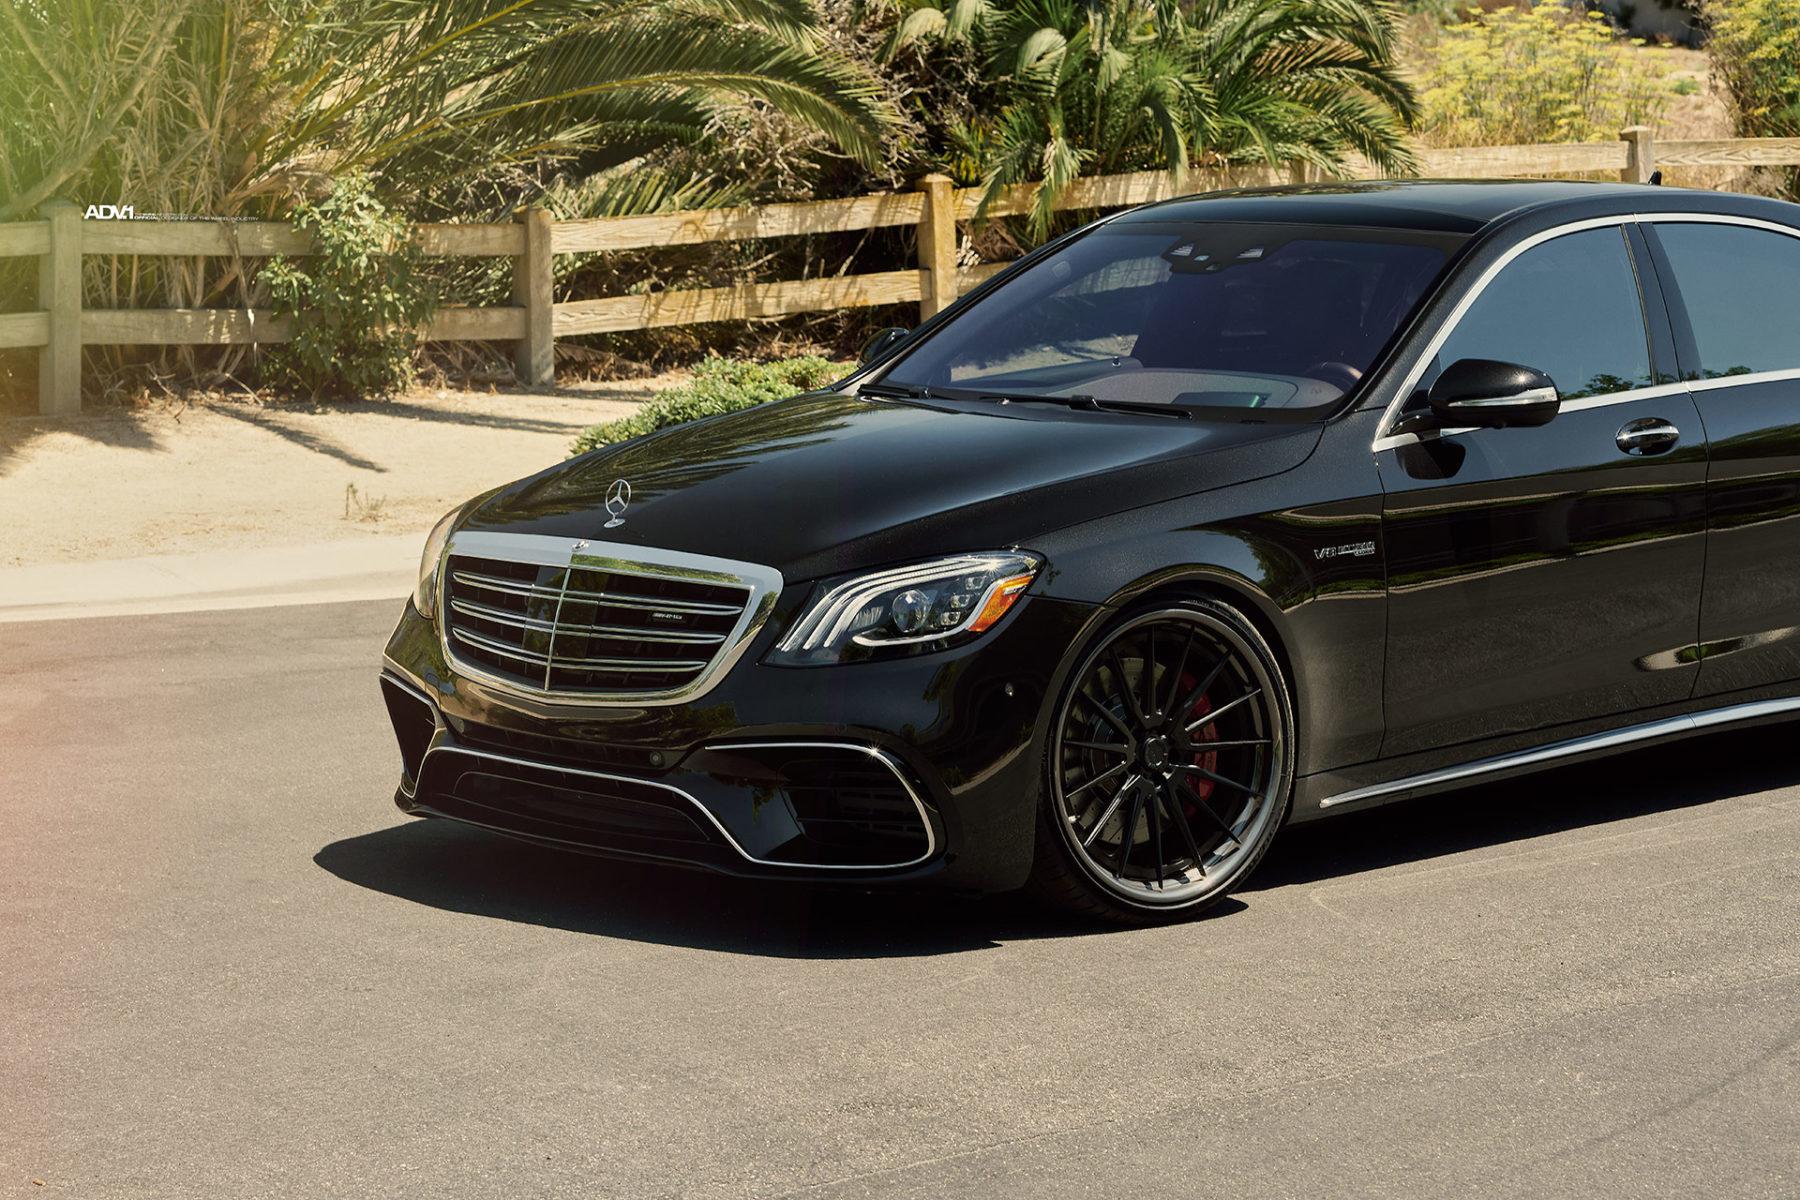 Black Mercedes S63 AMG - ADV15 Track Spec CS Wheels - Matte Black w/ Gloss Gunmetal Lips